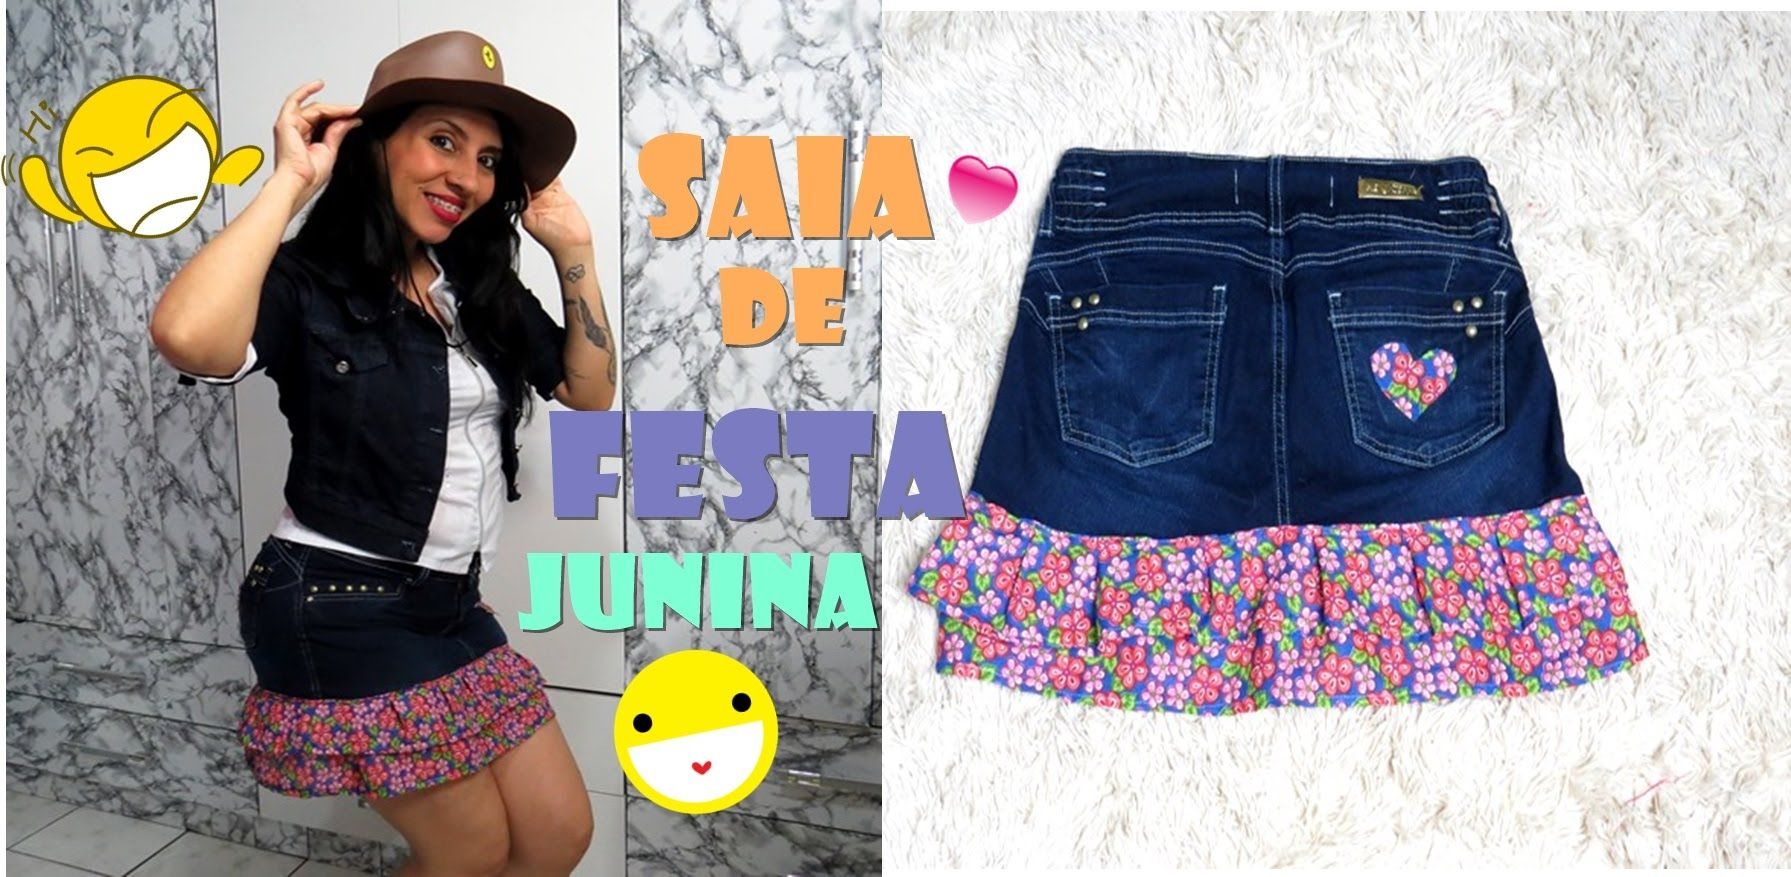 c1a898967980 saias gode jeans customizada para festa junina - Pesquisa Google ...